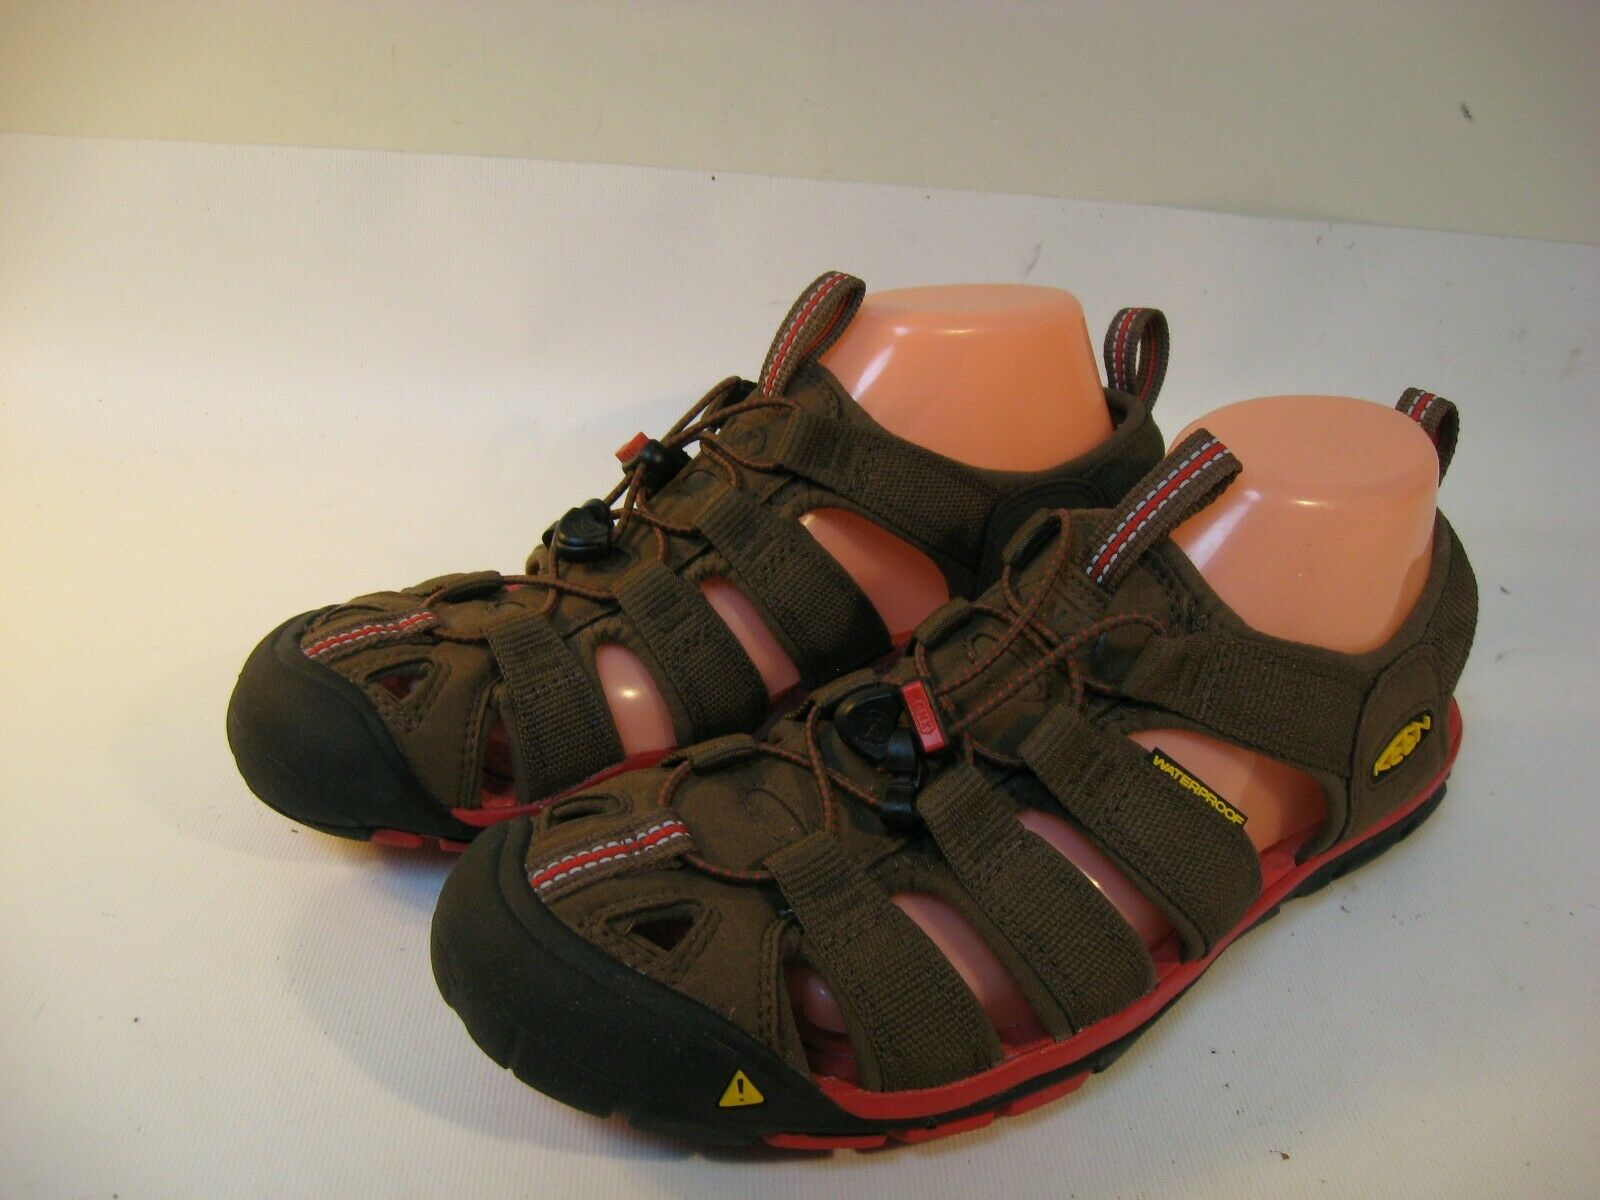 Keen Keen Keen Whisper Sandals Uomo Nylon Sport Marronee - US 9 (EU 42) 4e09b8